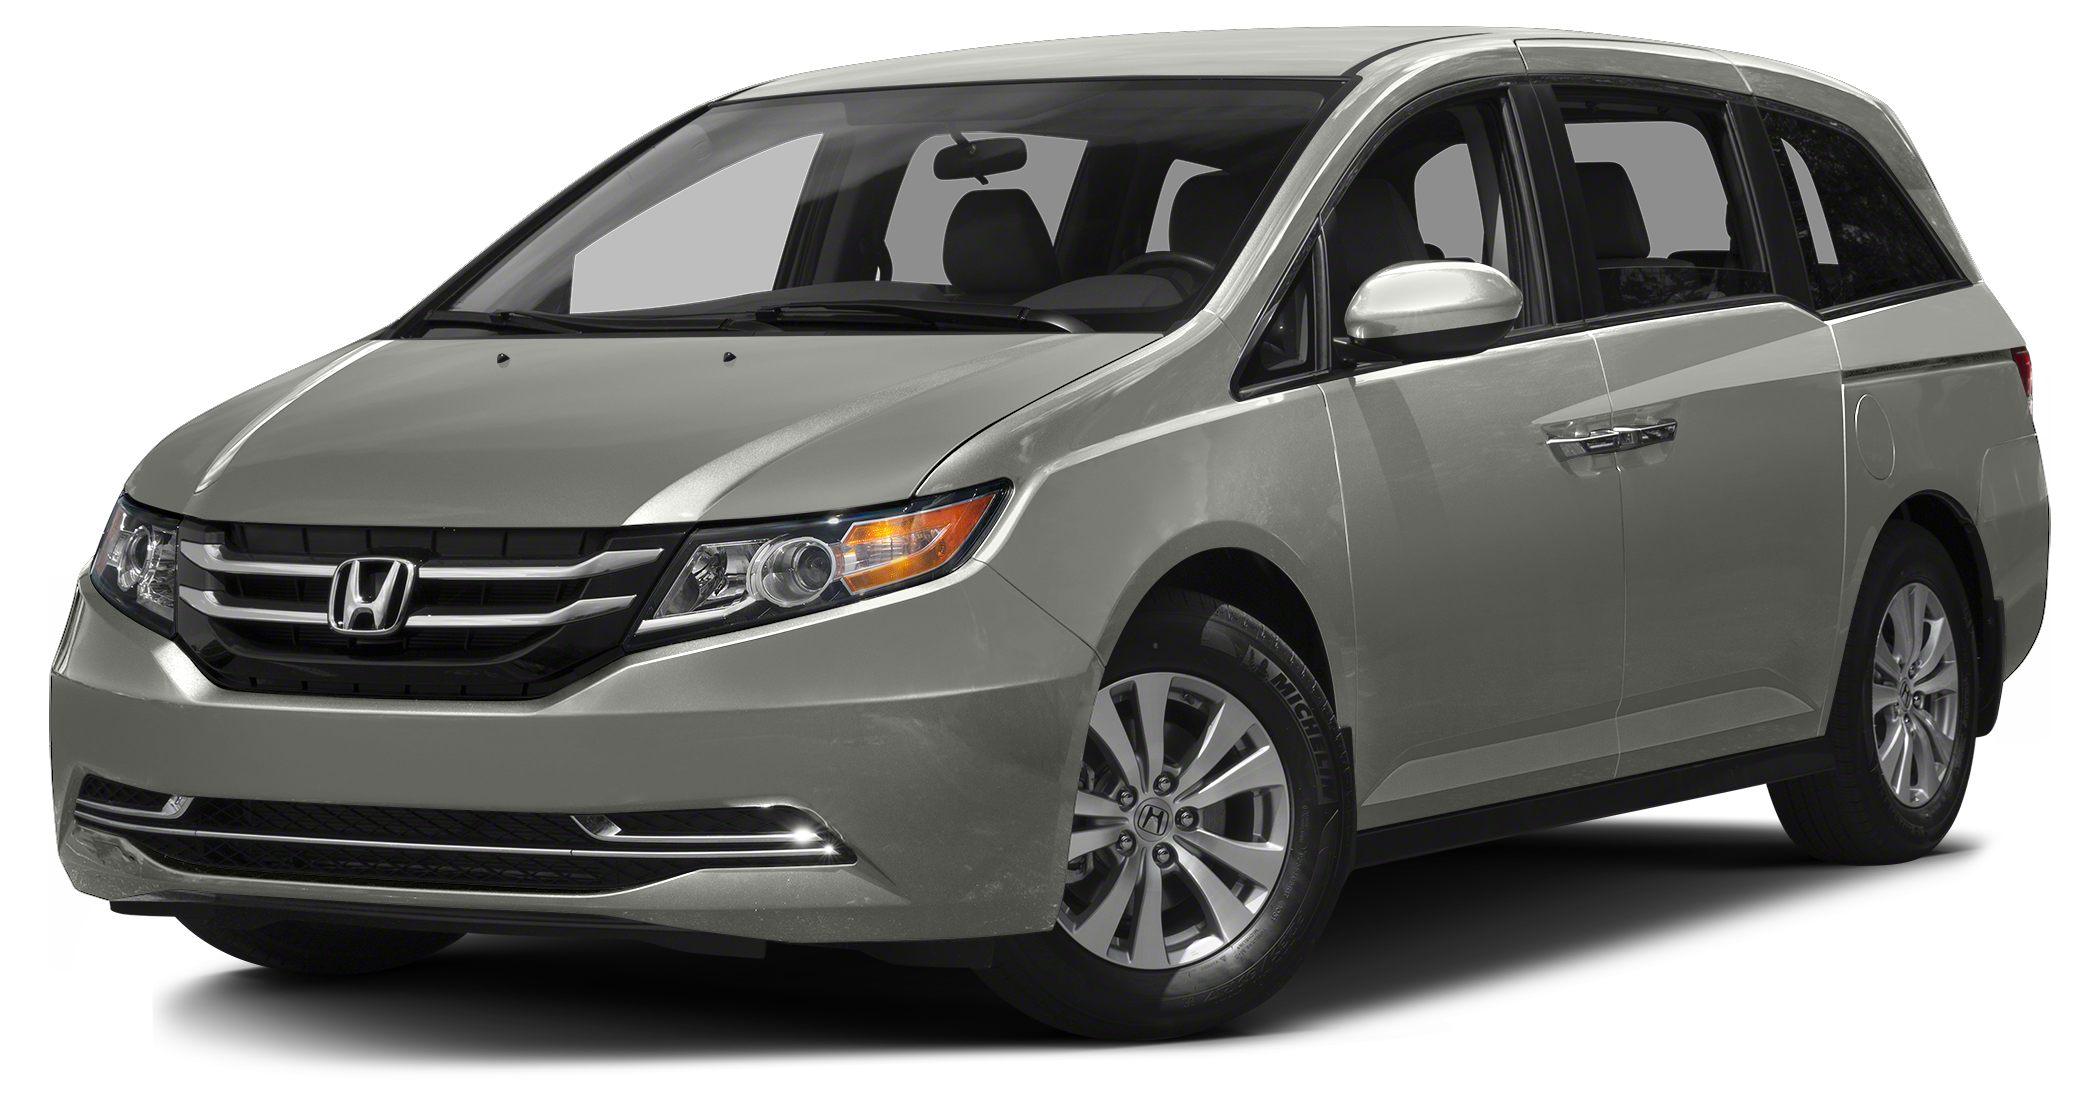 2016 Honda Odyssey EX FUEL EFFICIENT 28 MPG Hwy19 MPG City EX trim Third Row Seat Keyless Star